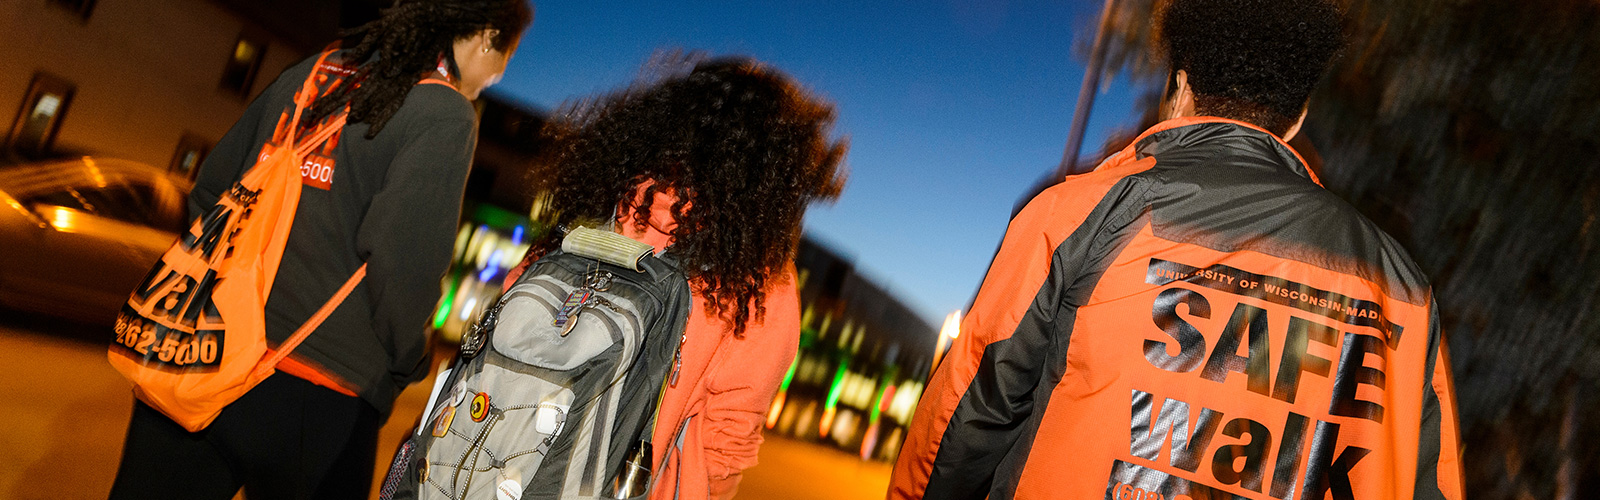 SafeWalk escorting a student at night